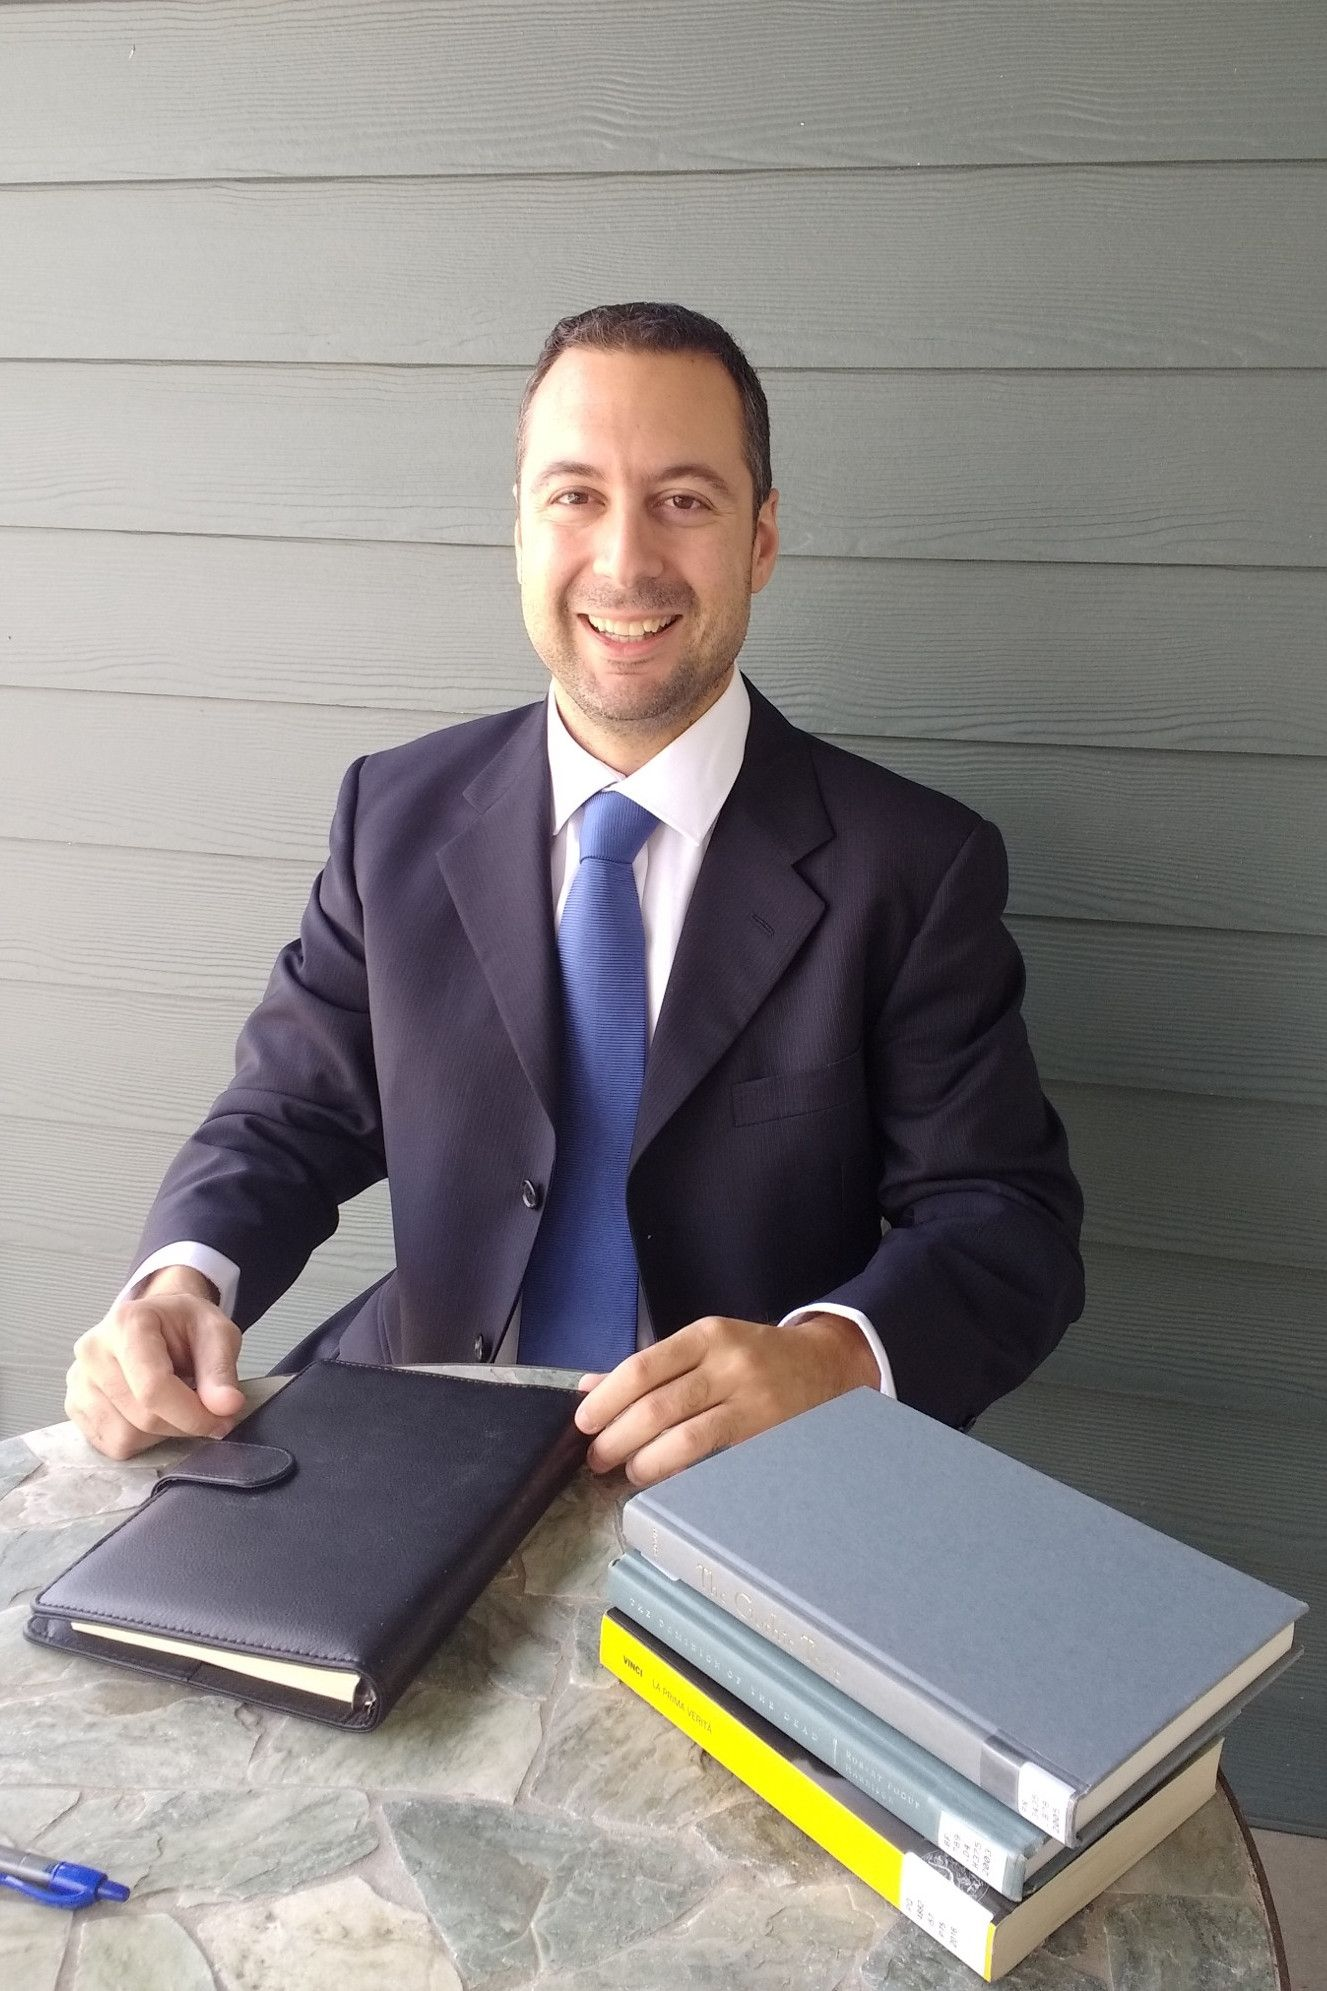 Angelo Castagnino